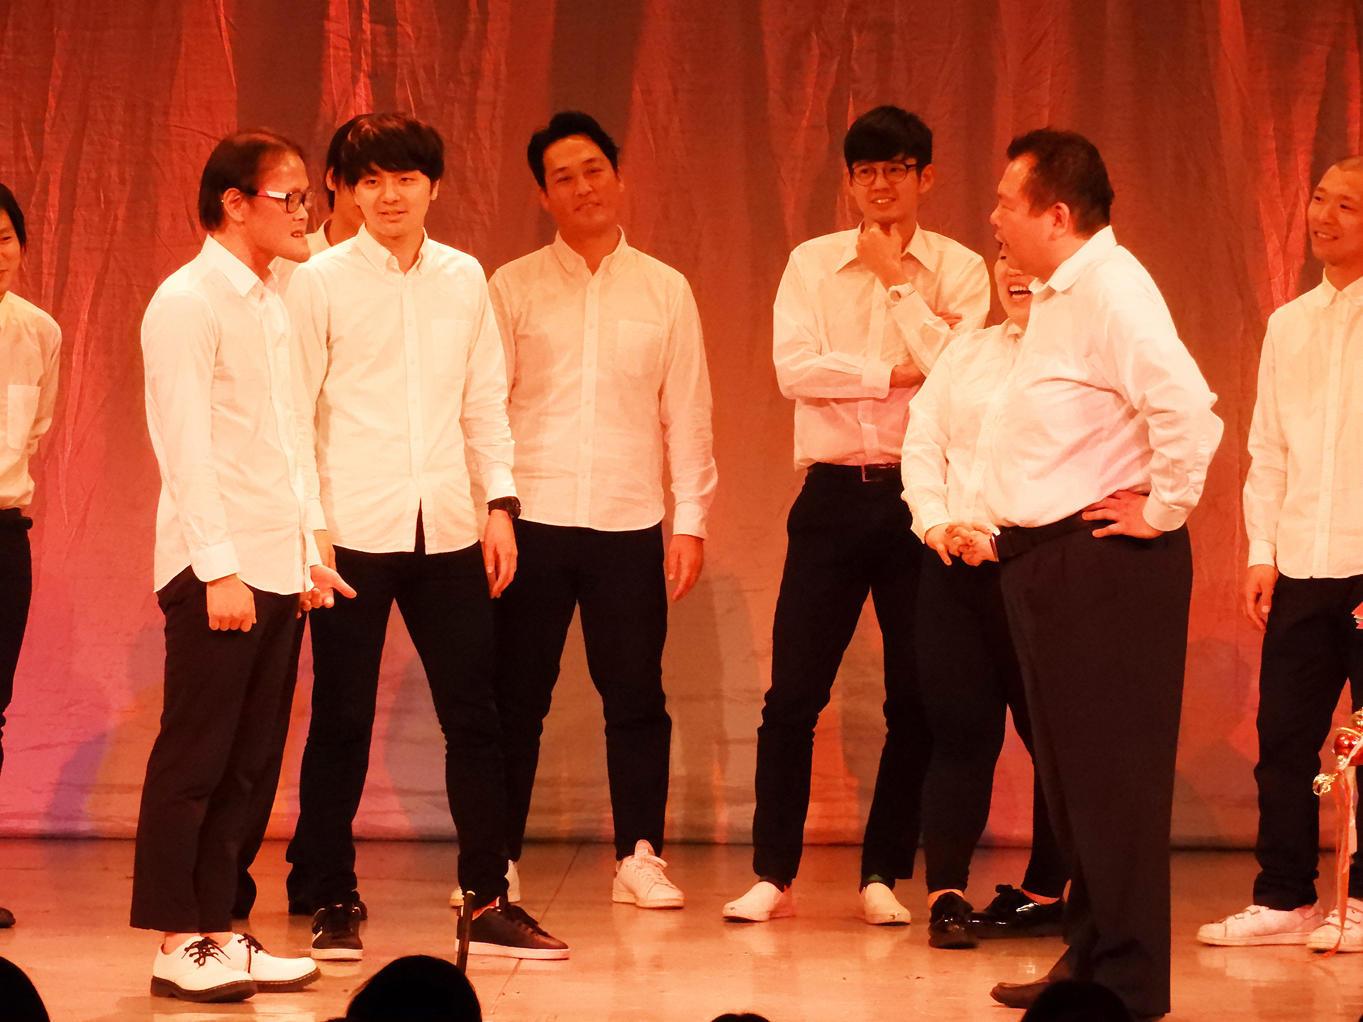 http://news.yoshimoto.co.jp/20180312104504-2b43c92c57e80480b294c9972ffa9f2df03ca05c.jpg